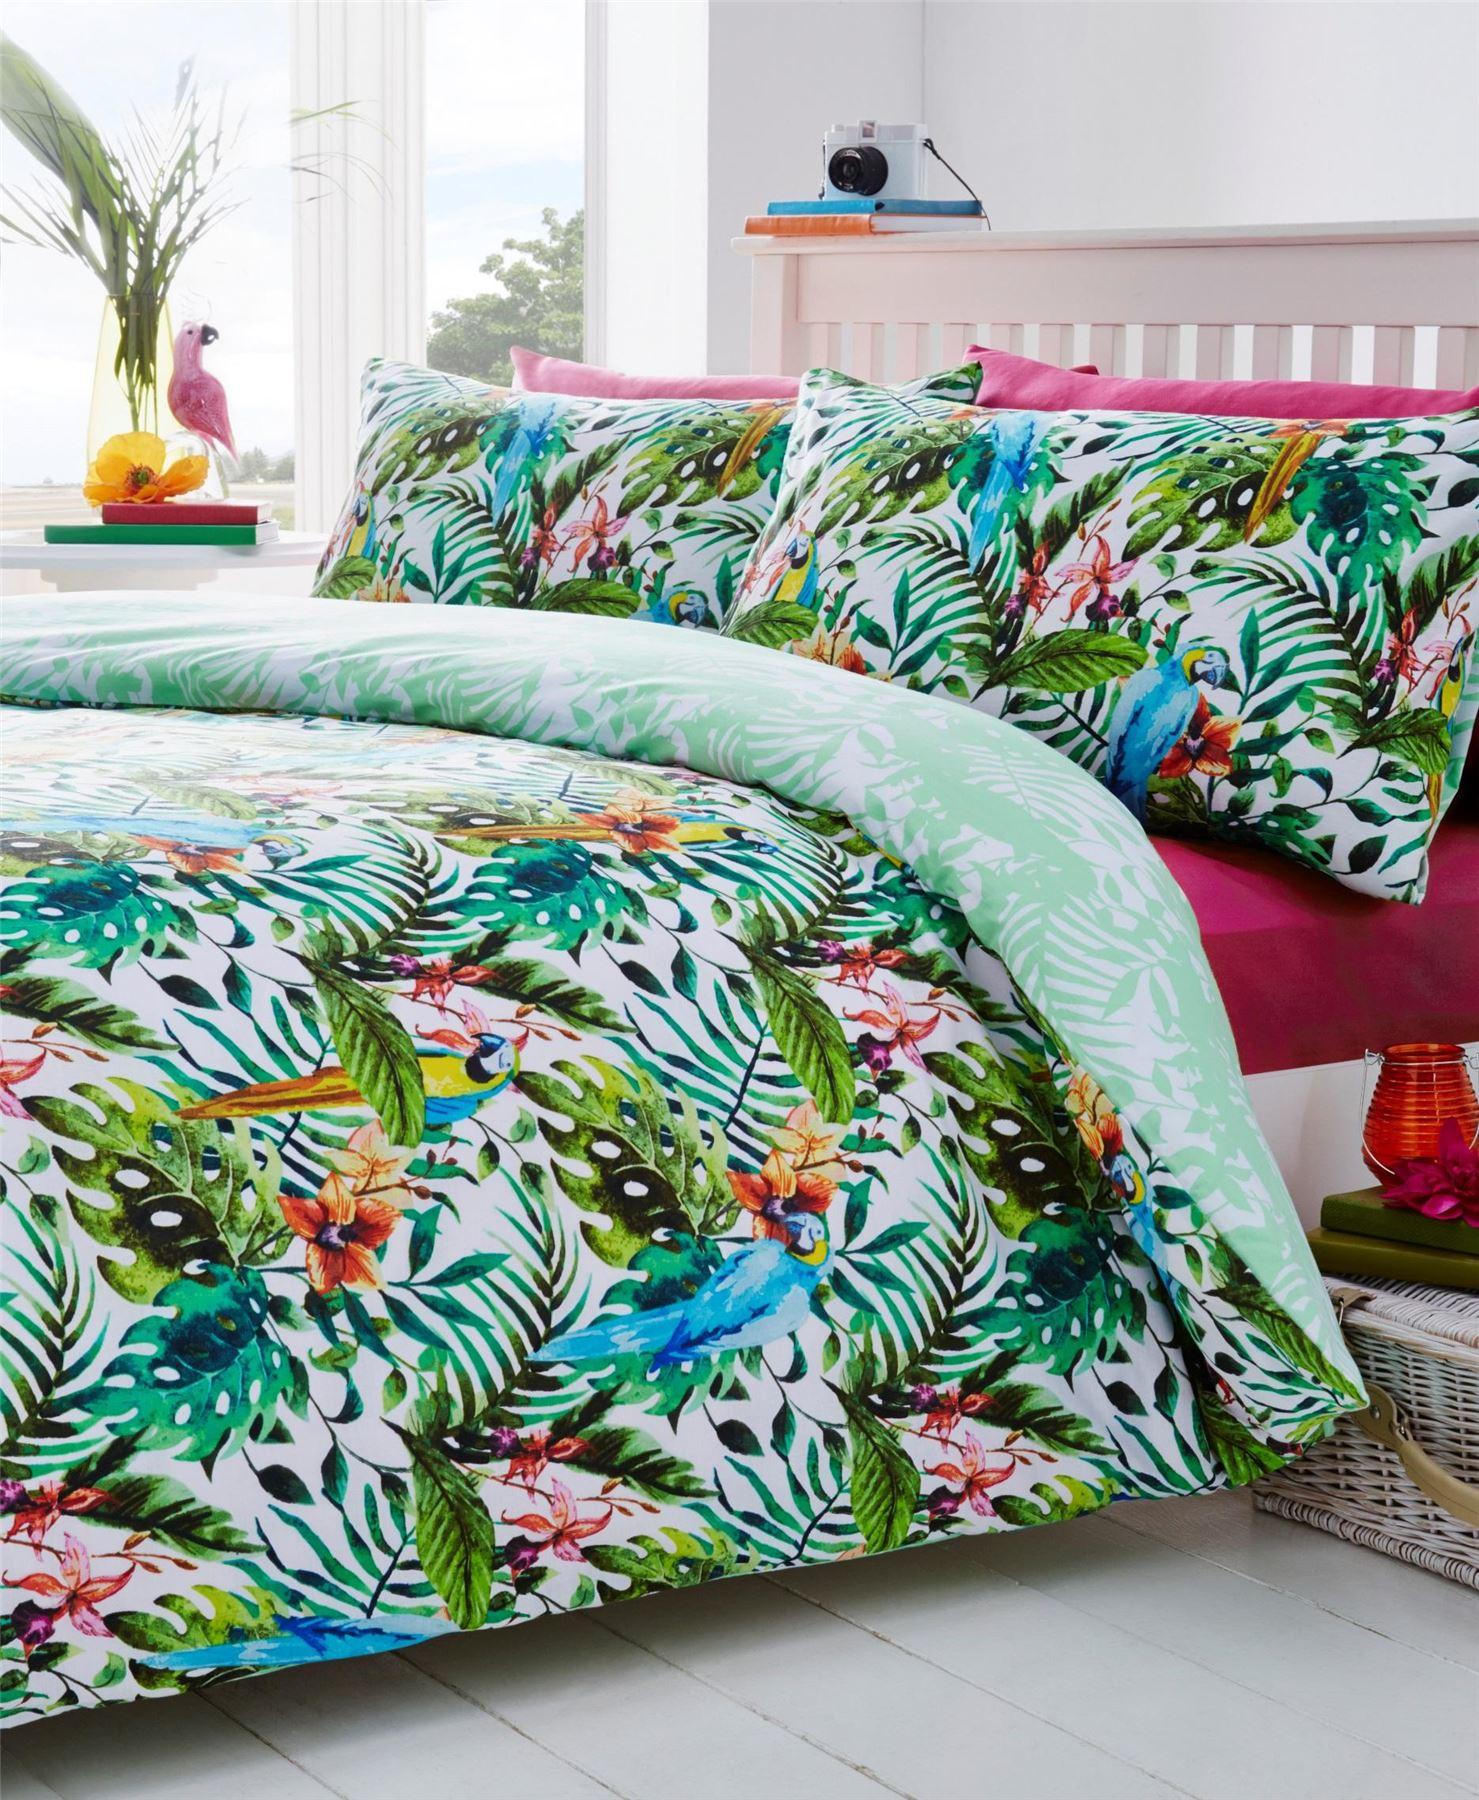 Bird Floral Nature Quilt Duvet Cover & Pillowcase Bedding Bed Set 4 Sizes | eBay